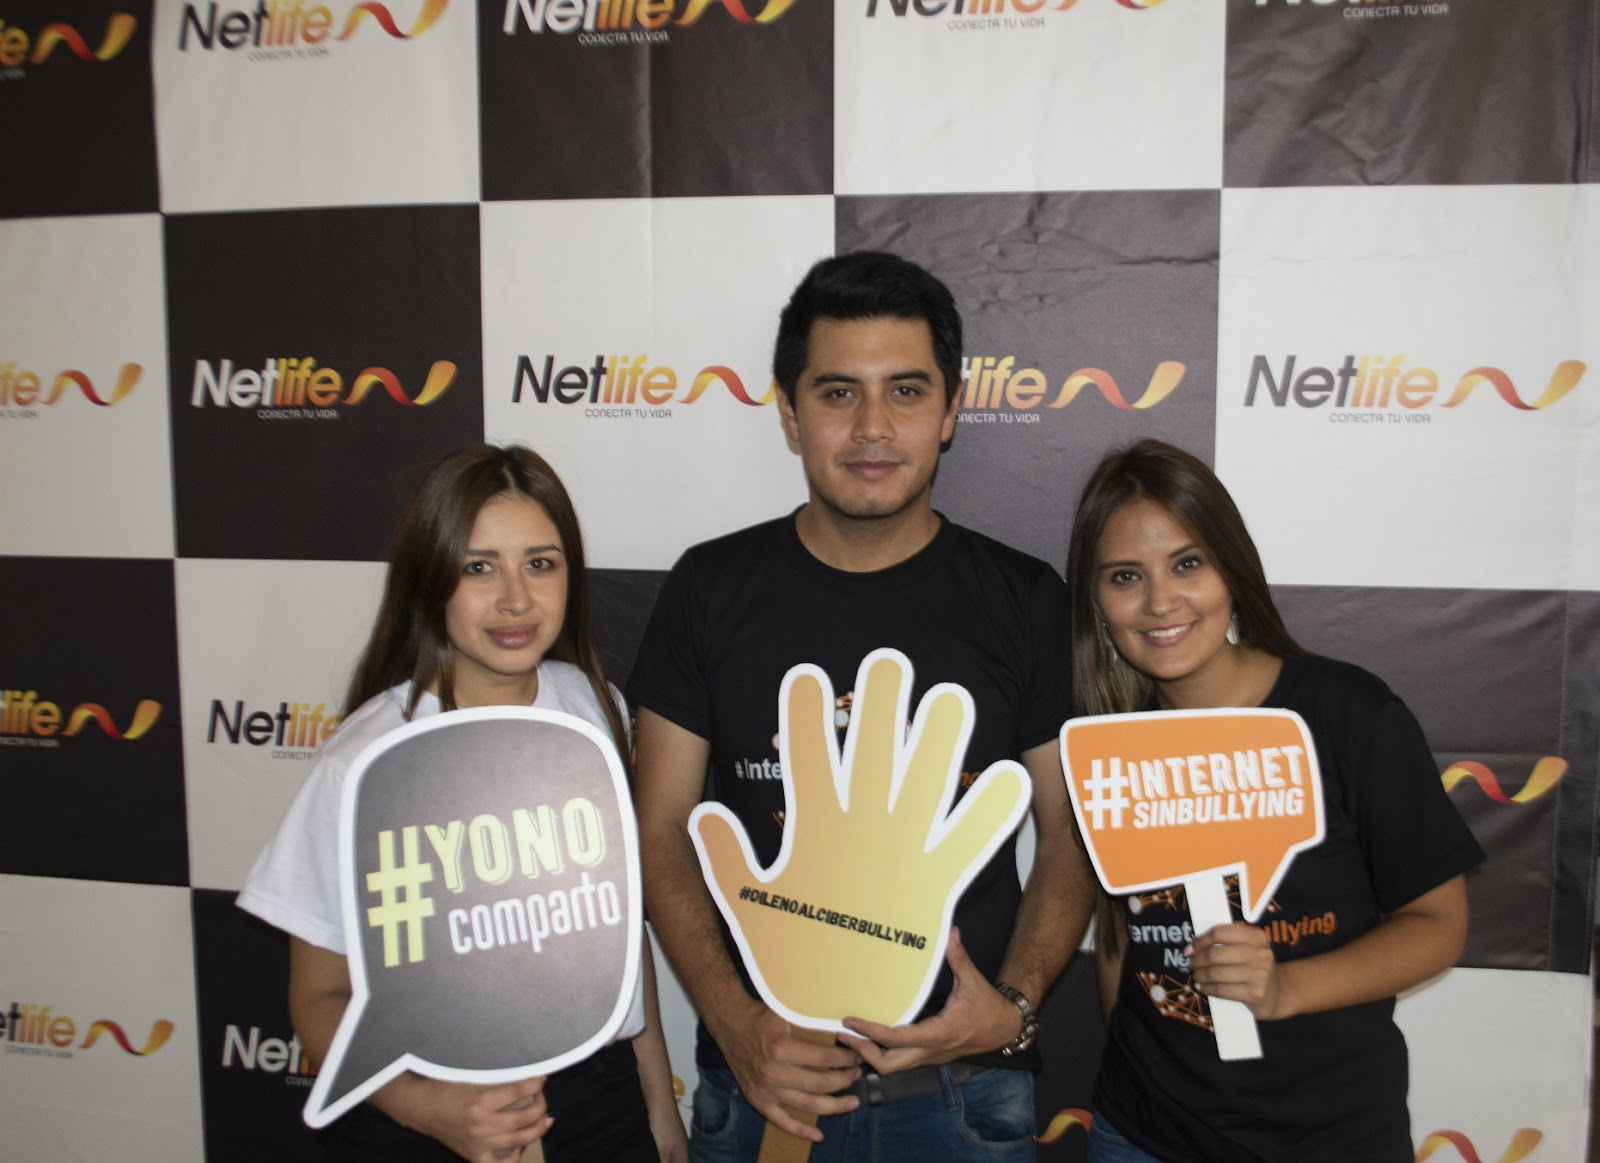 Netlife lanza campaña #internetsinbullying